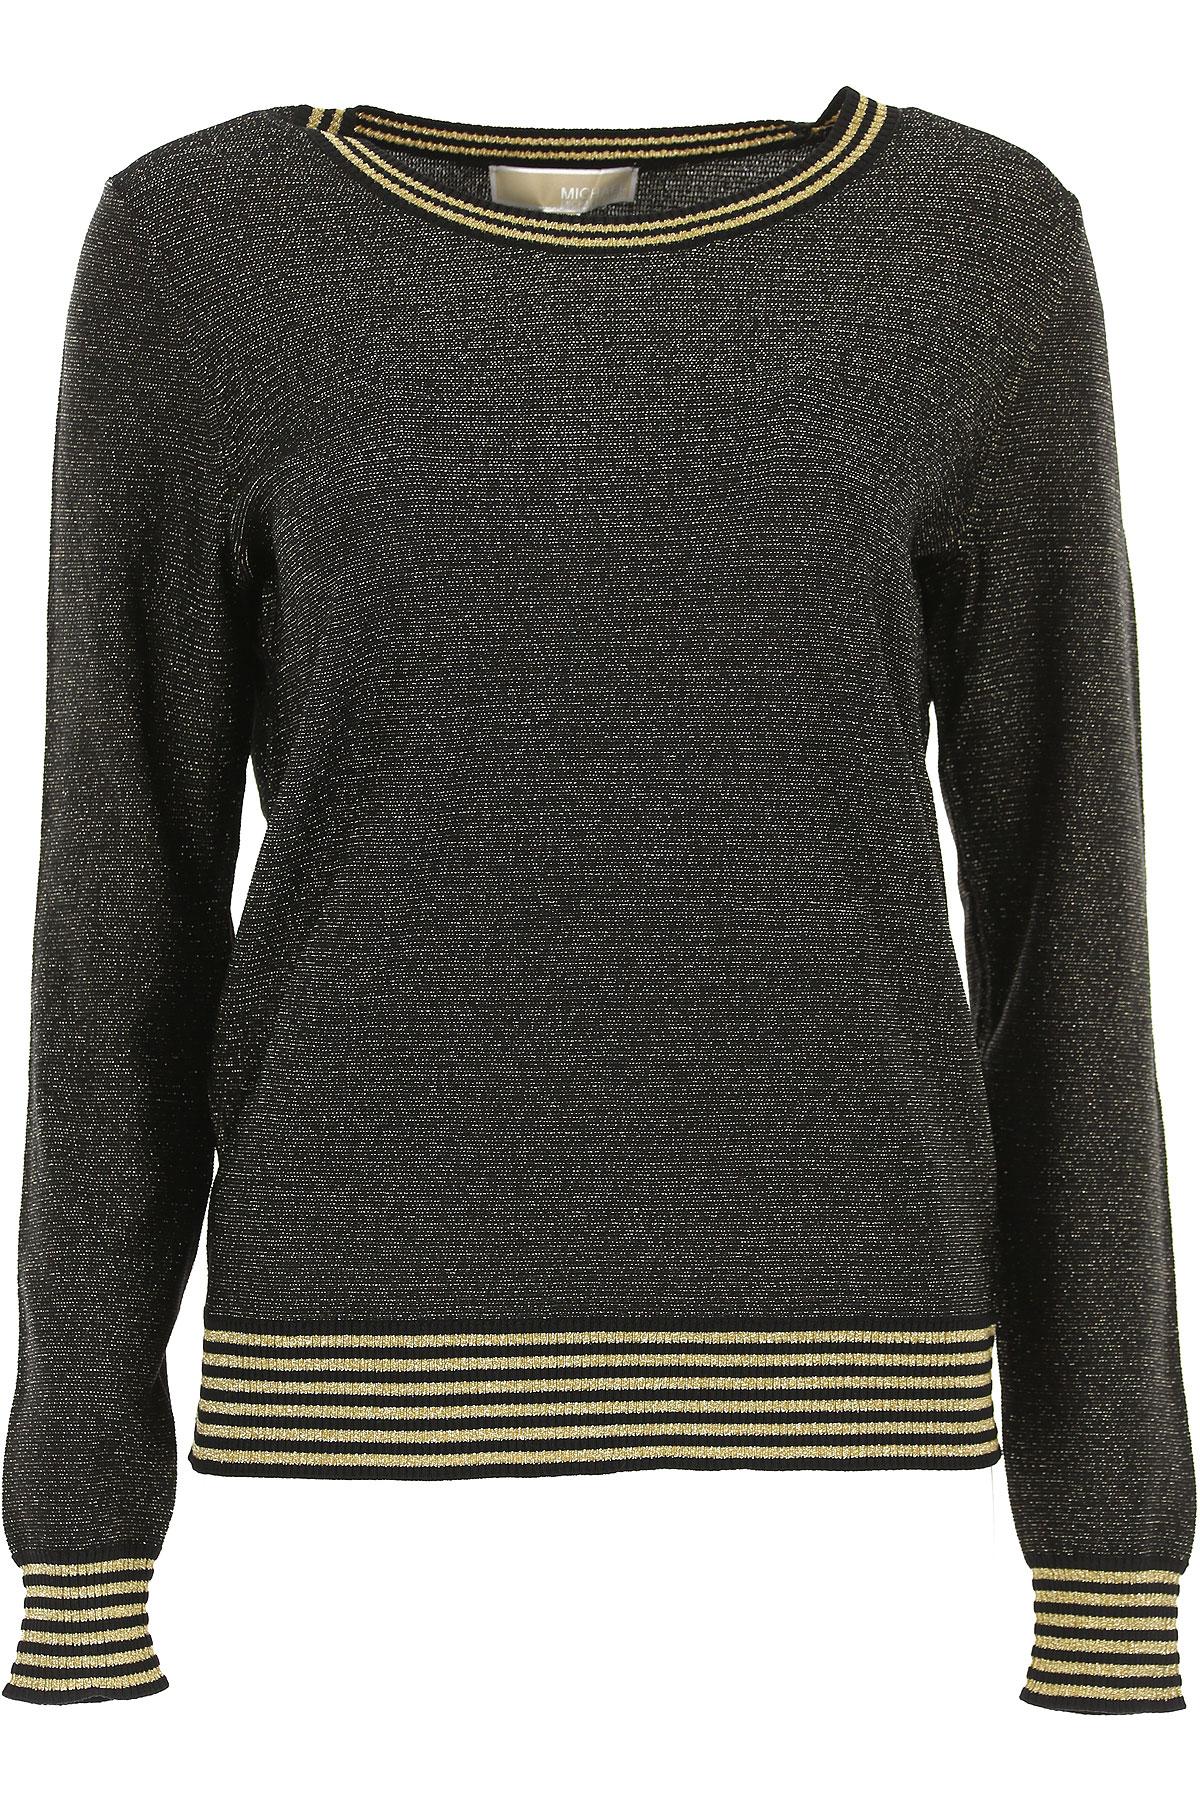 Michael Kors Sweater for Women Jumper, Black, Viscose, 2019, 10 12 6 8